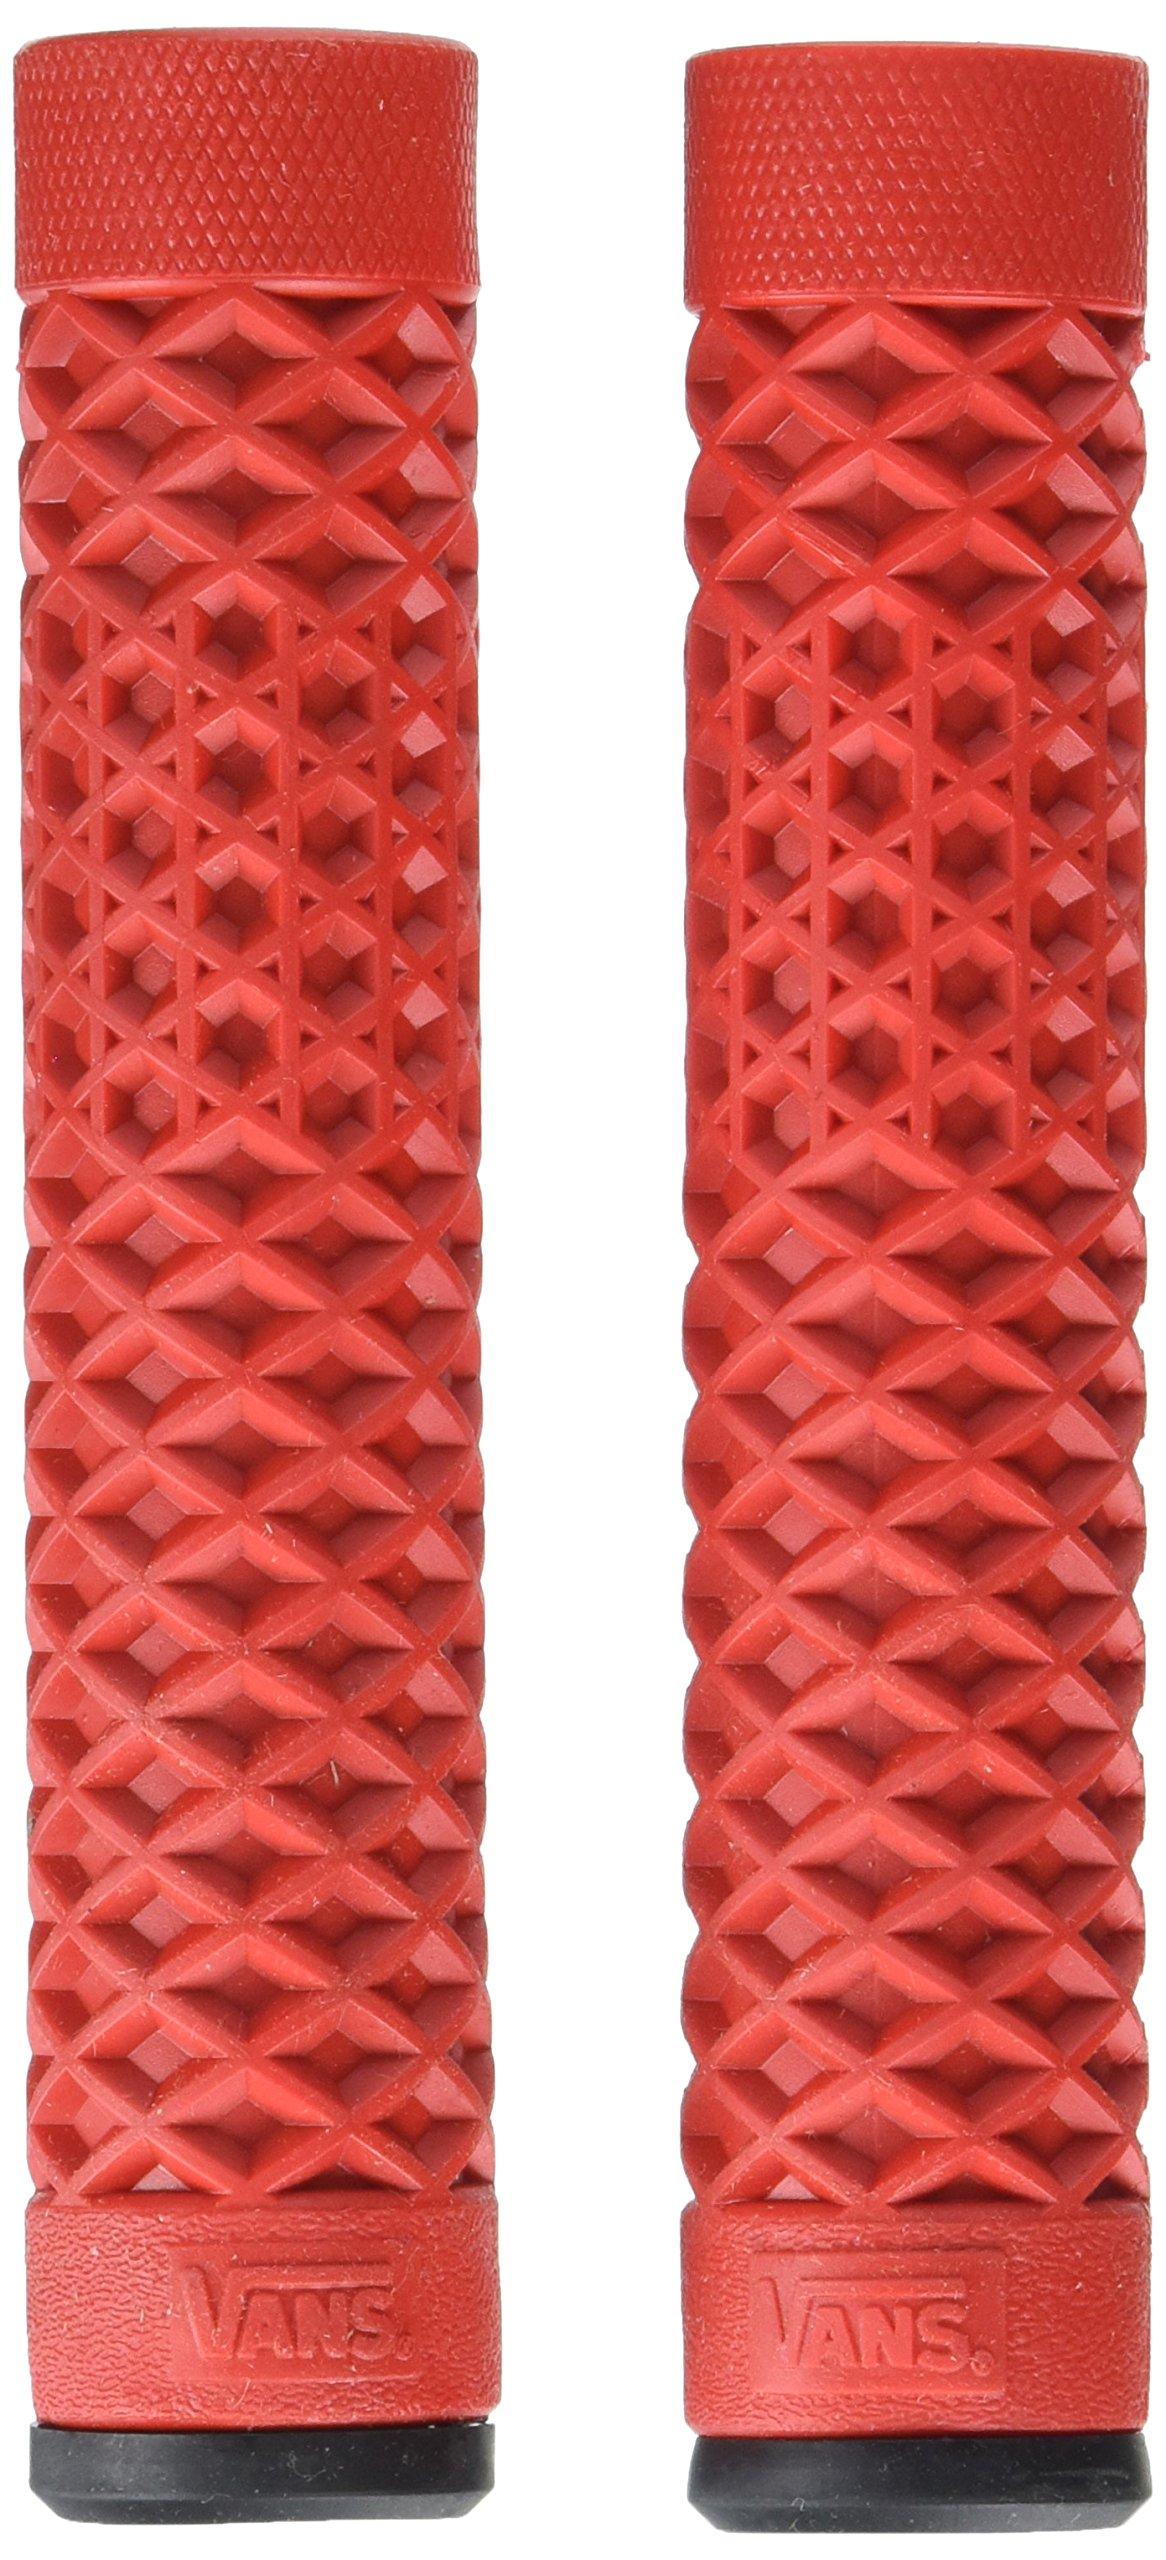 Vans x Cult Flangeless Bike Grips, Red by Vans